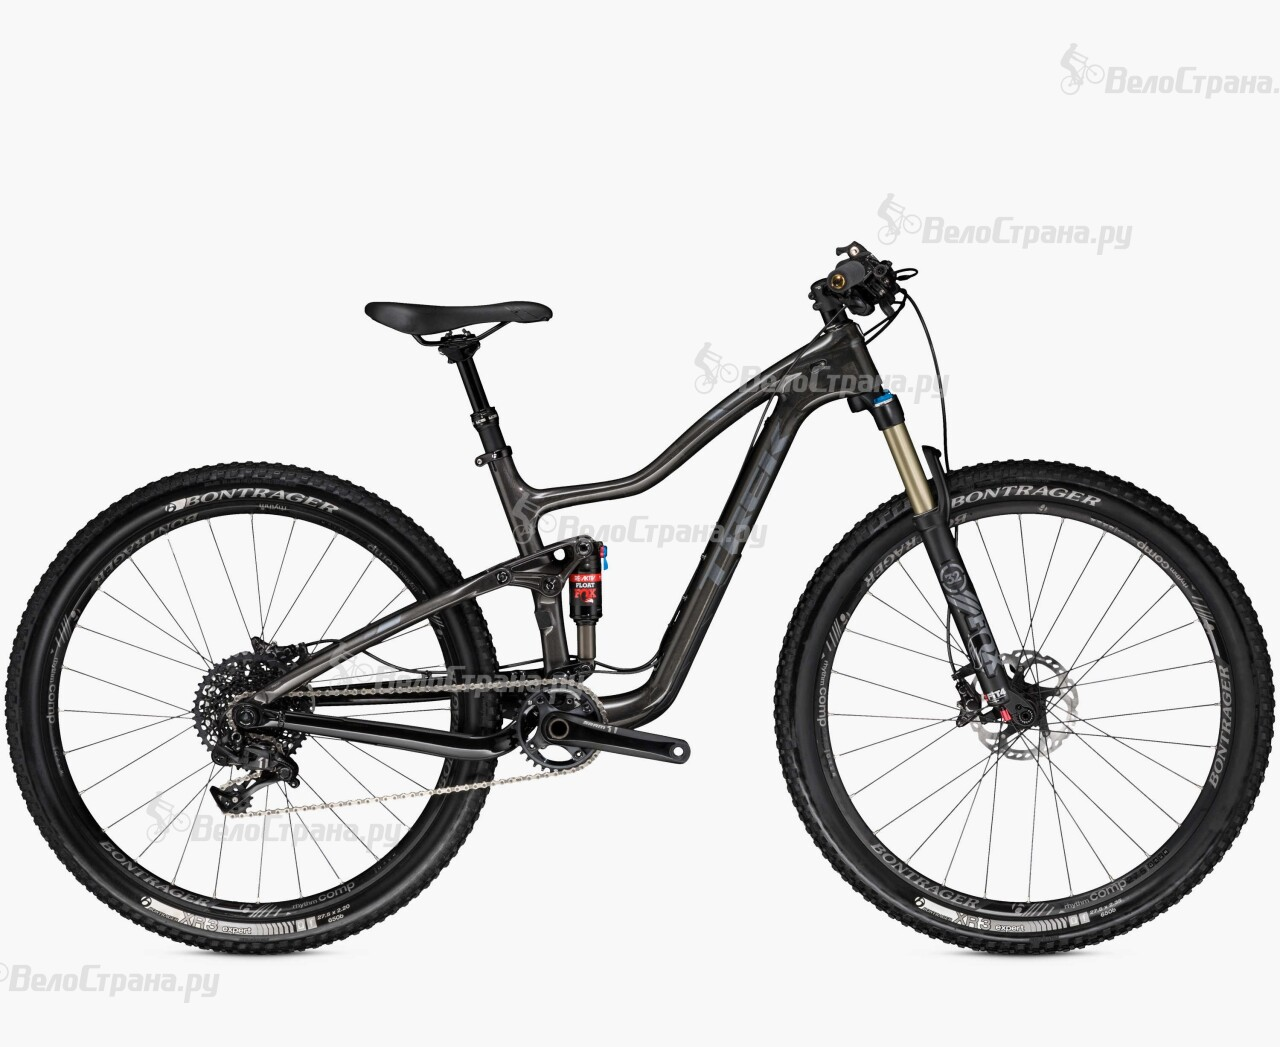 Велосипед Trek Lush Carbon 27.5 Women's (2016) шампунь lush soak and float